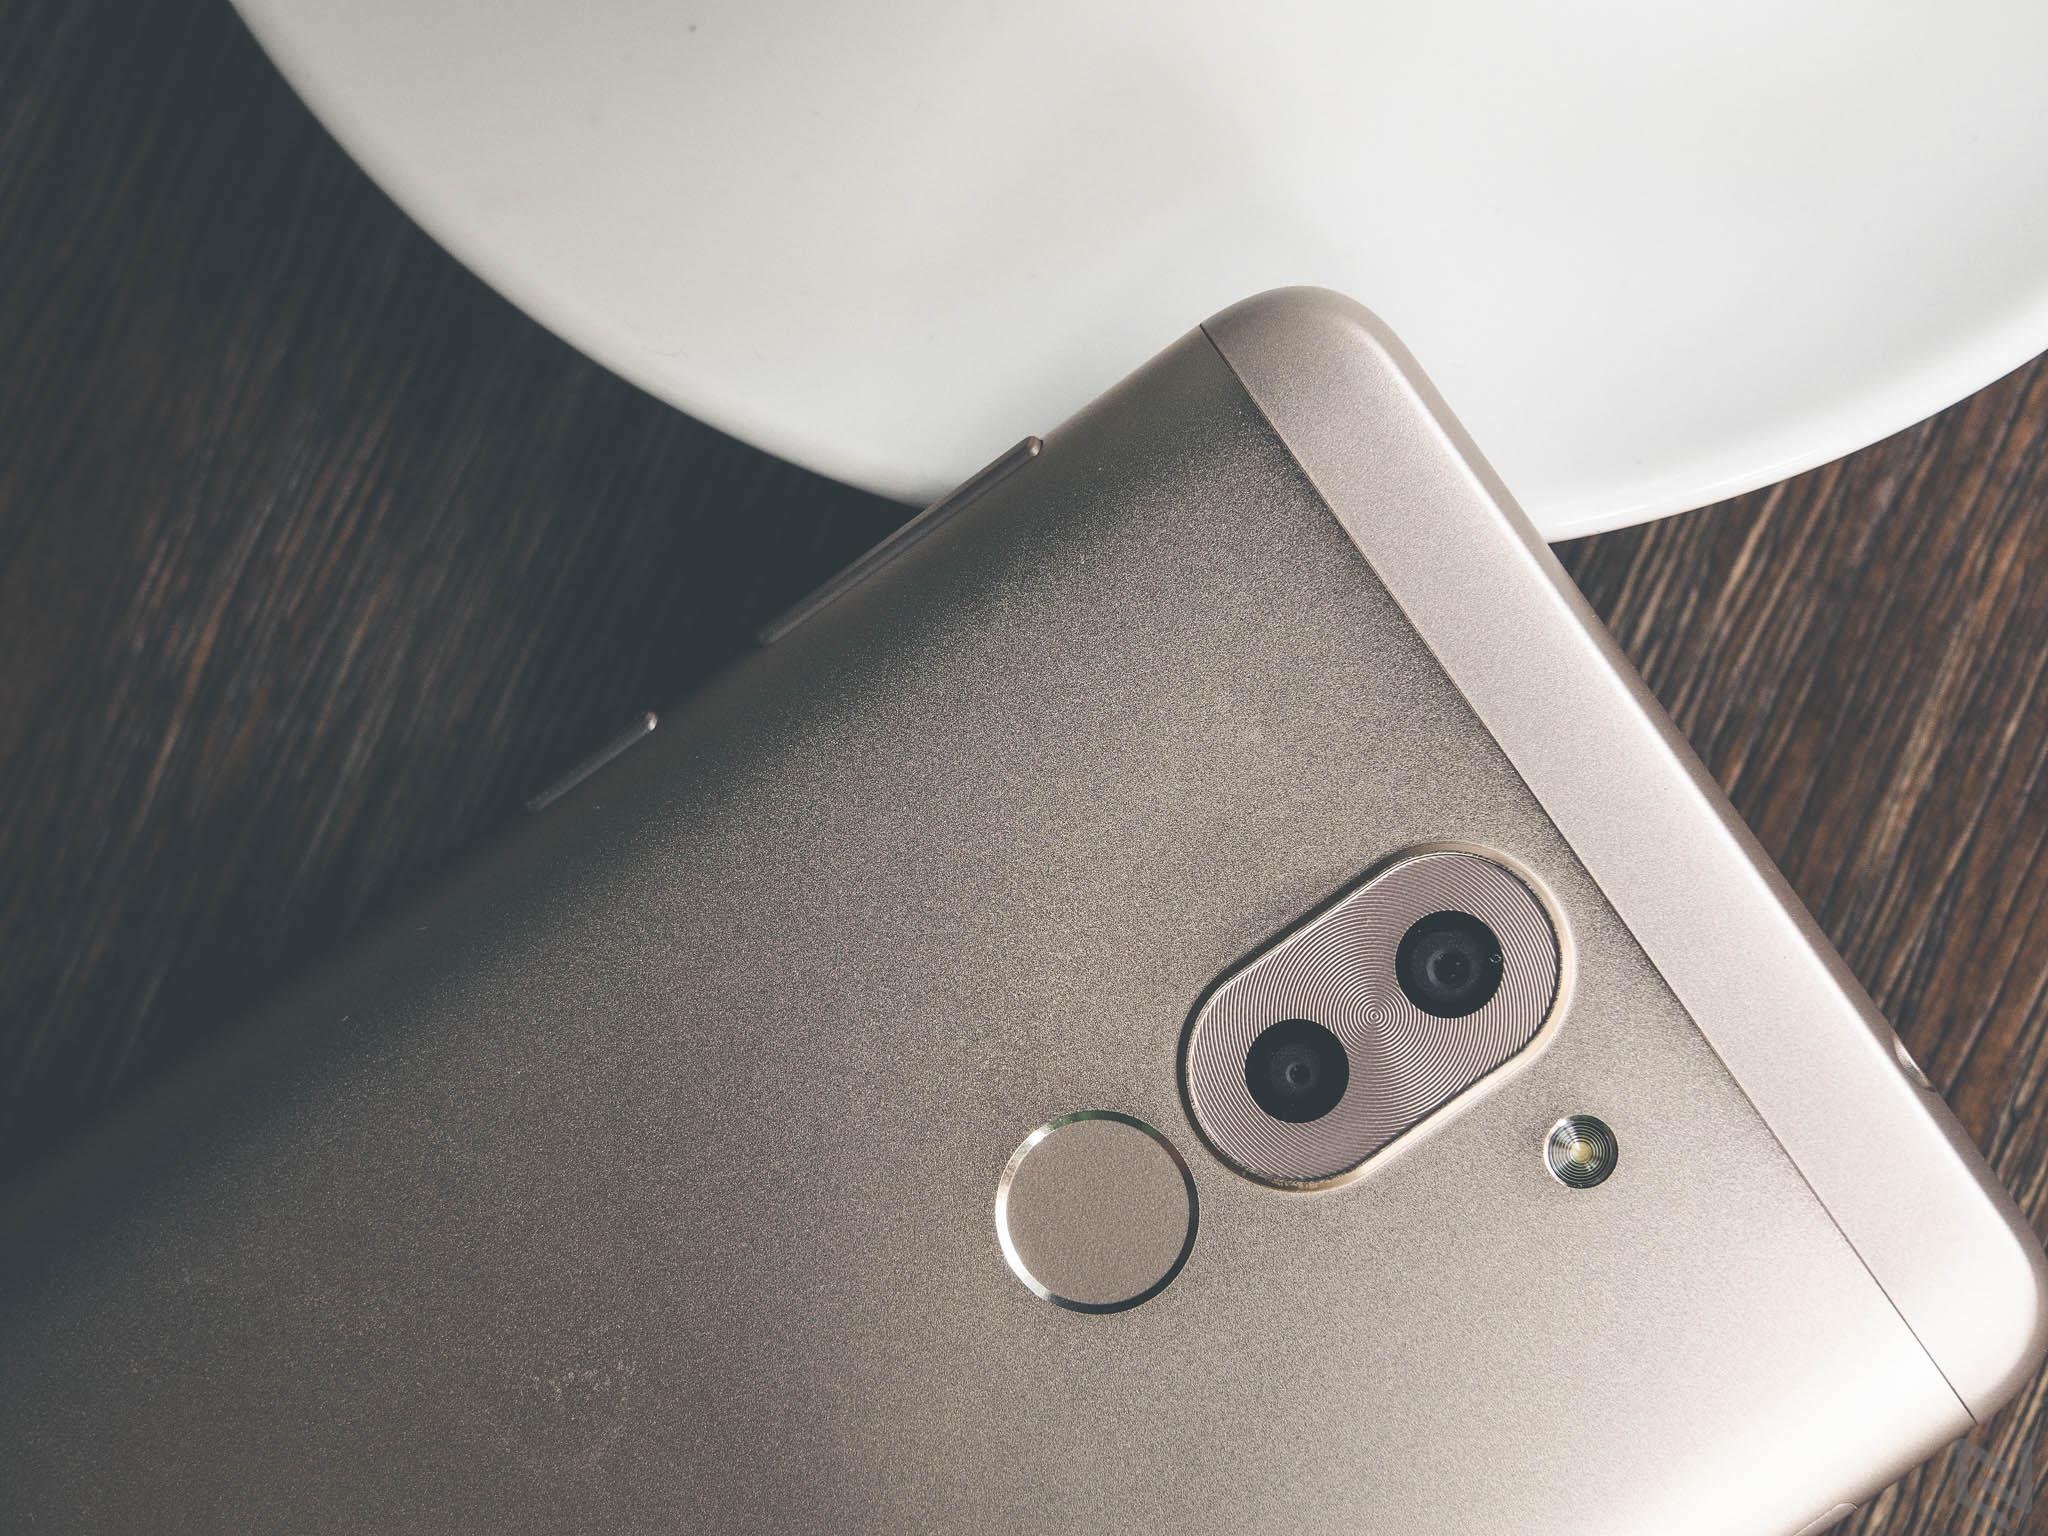 Trên tay Huawei GR5 2017